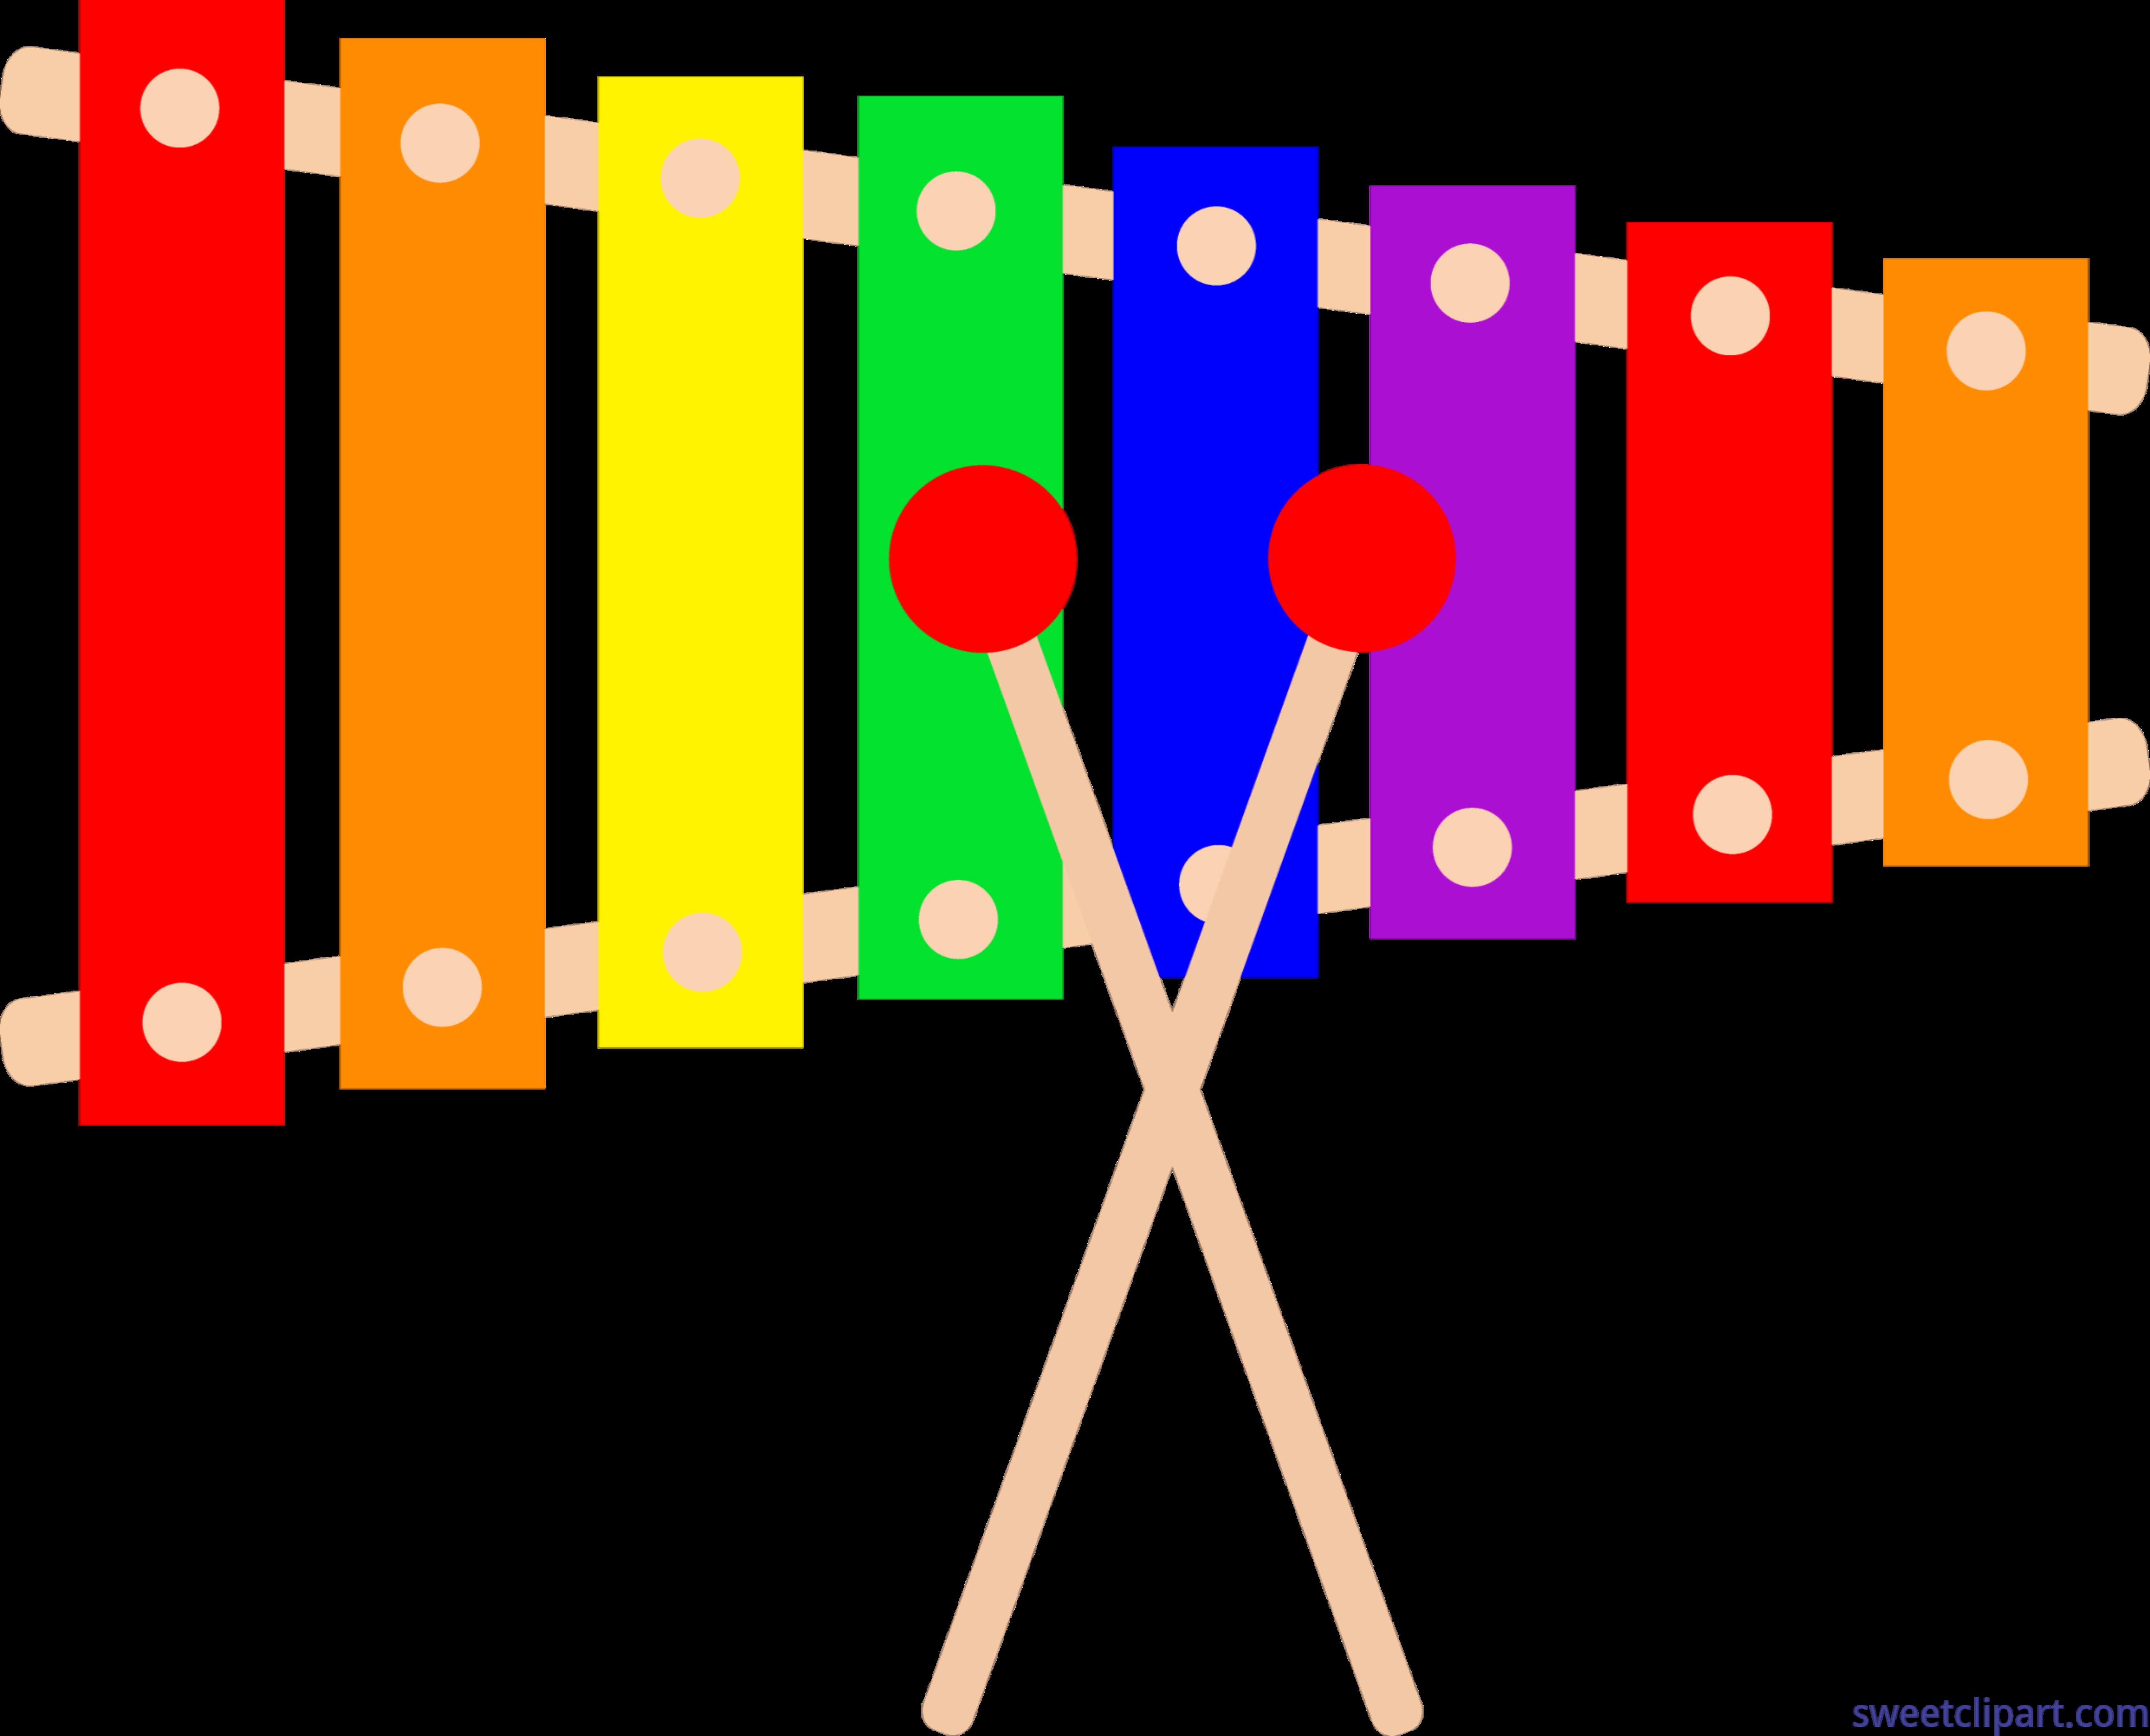 jpg Xylophone clipart. Clip art sweet